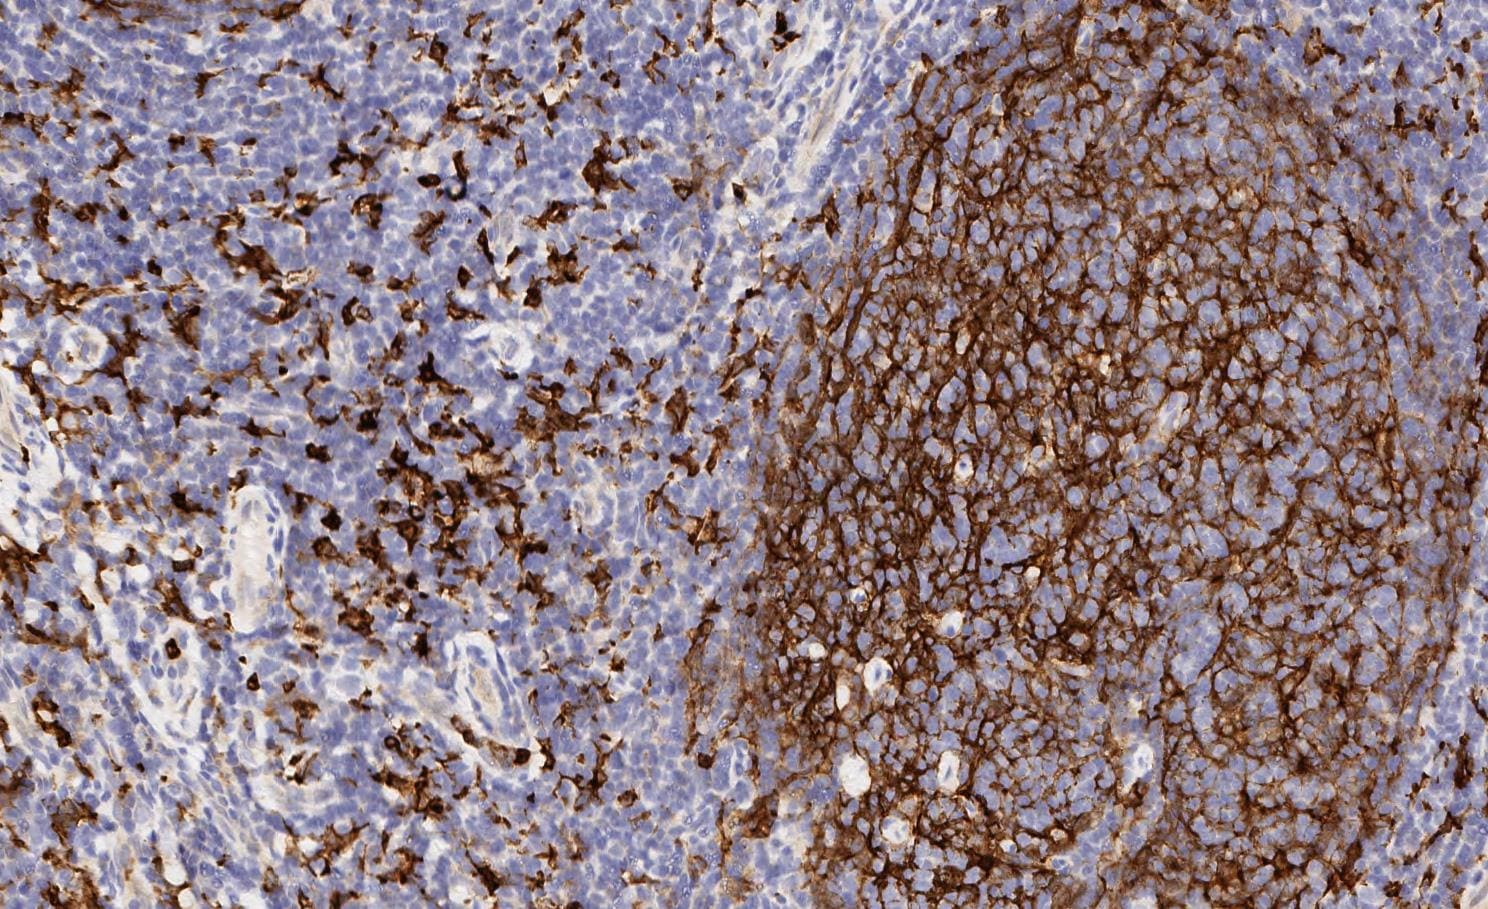 Immunohistochemistry (Formalin/PFA-fixed paraffin-embedded sections) - Anti-CD11b antibody [EPR1344] - Low endotoxin, Azide free (ab216445)